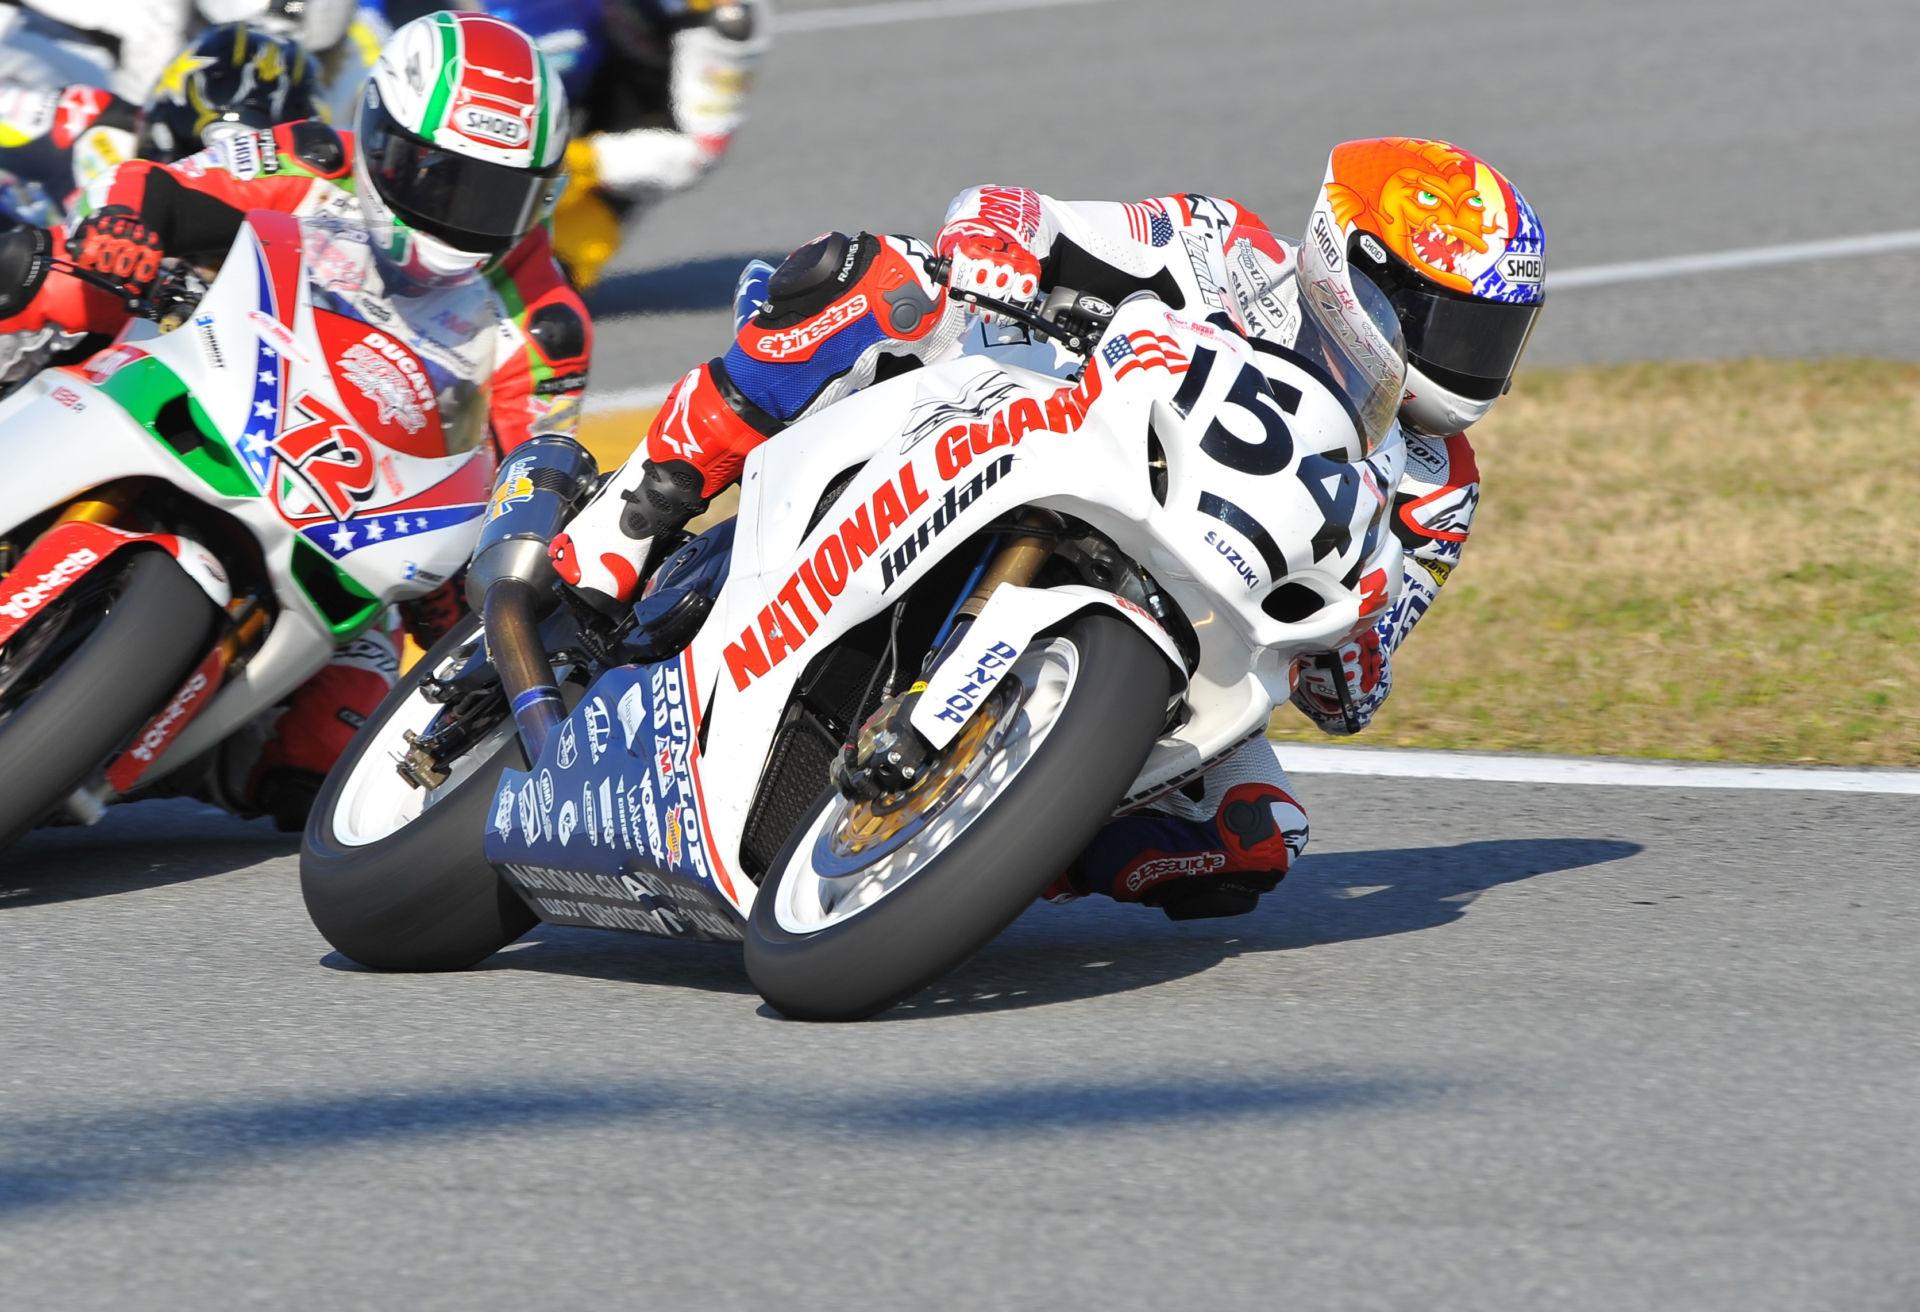 Jake Zemke (54), riding a Suzuki GSX-R1000, also won both AMA Superbike races at Daytona International Speedway in 2010. Photo by Nelson & Riles.